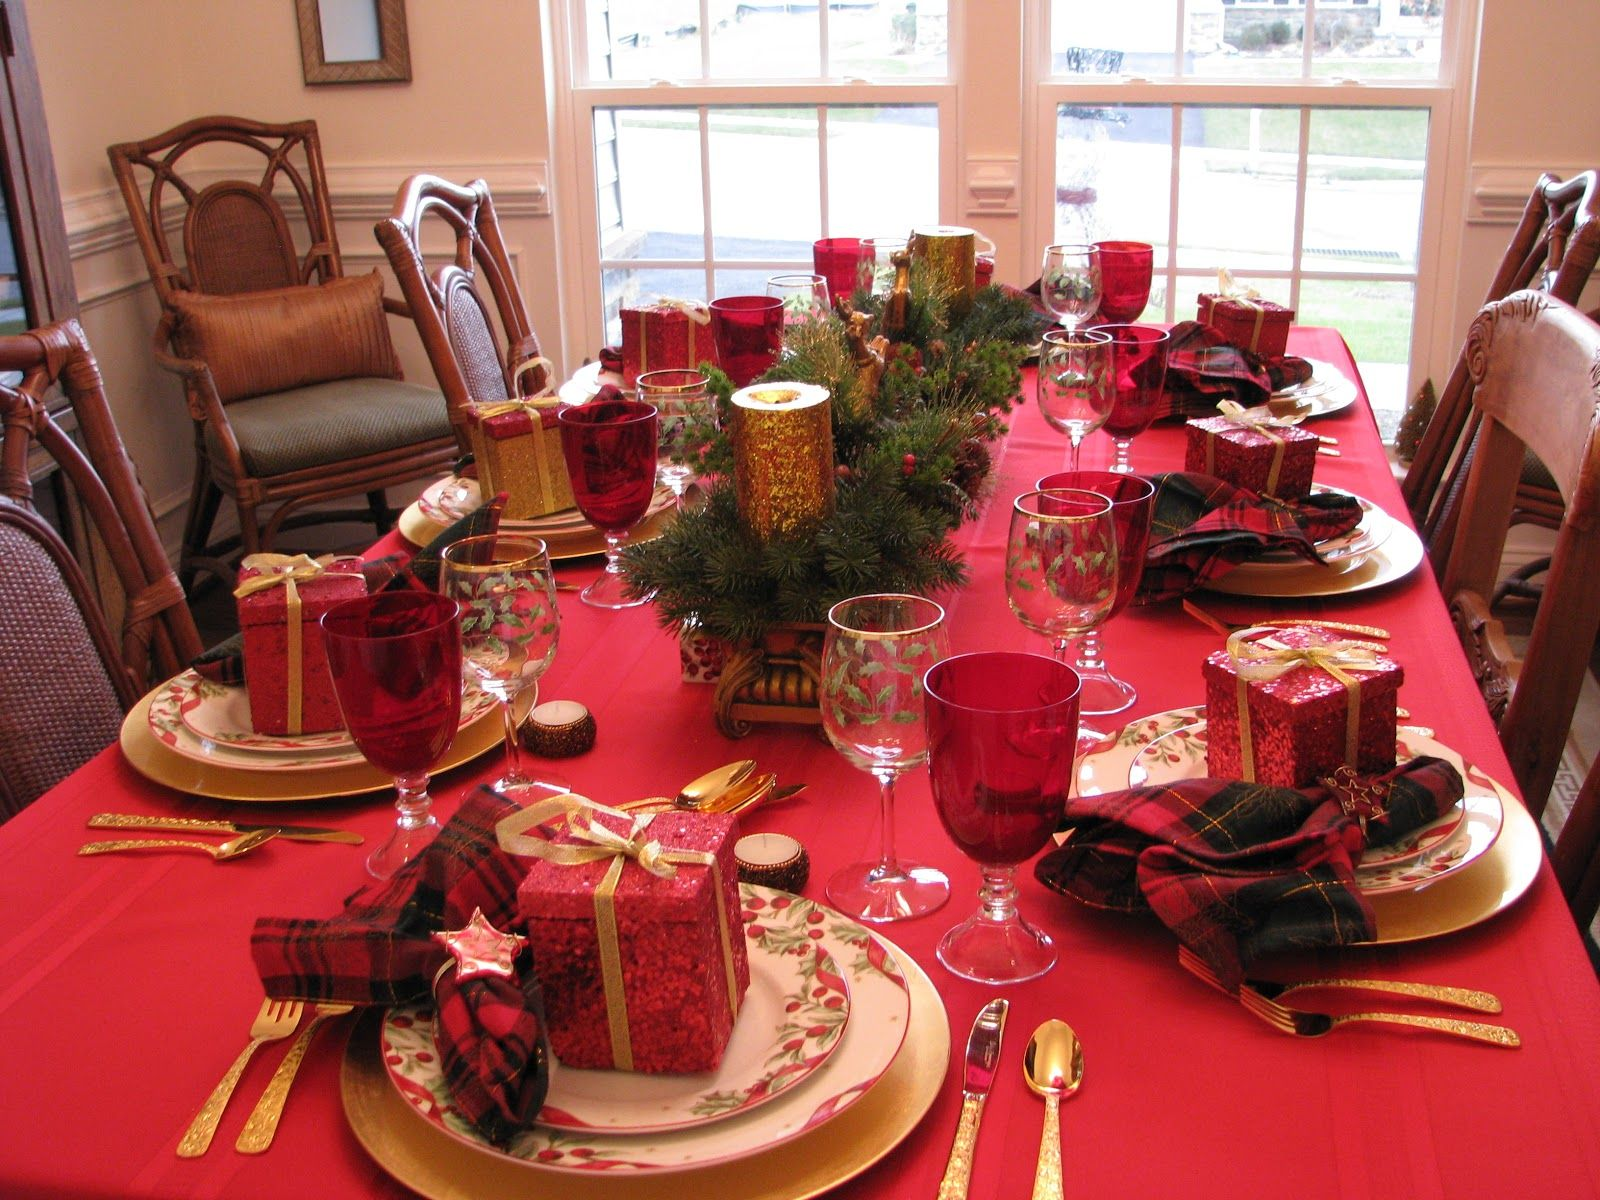 Christmas table decorations gold - Uncategorized Thrift Christmas Dinner Table Decoration Ideas Christmas Dinner Table Decoration Ideas Christmas Dining Room Table Decoration Ideas C